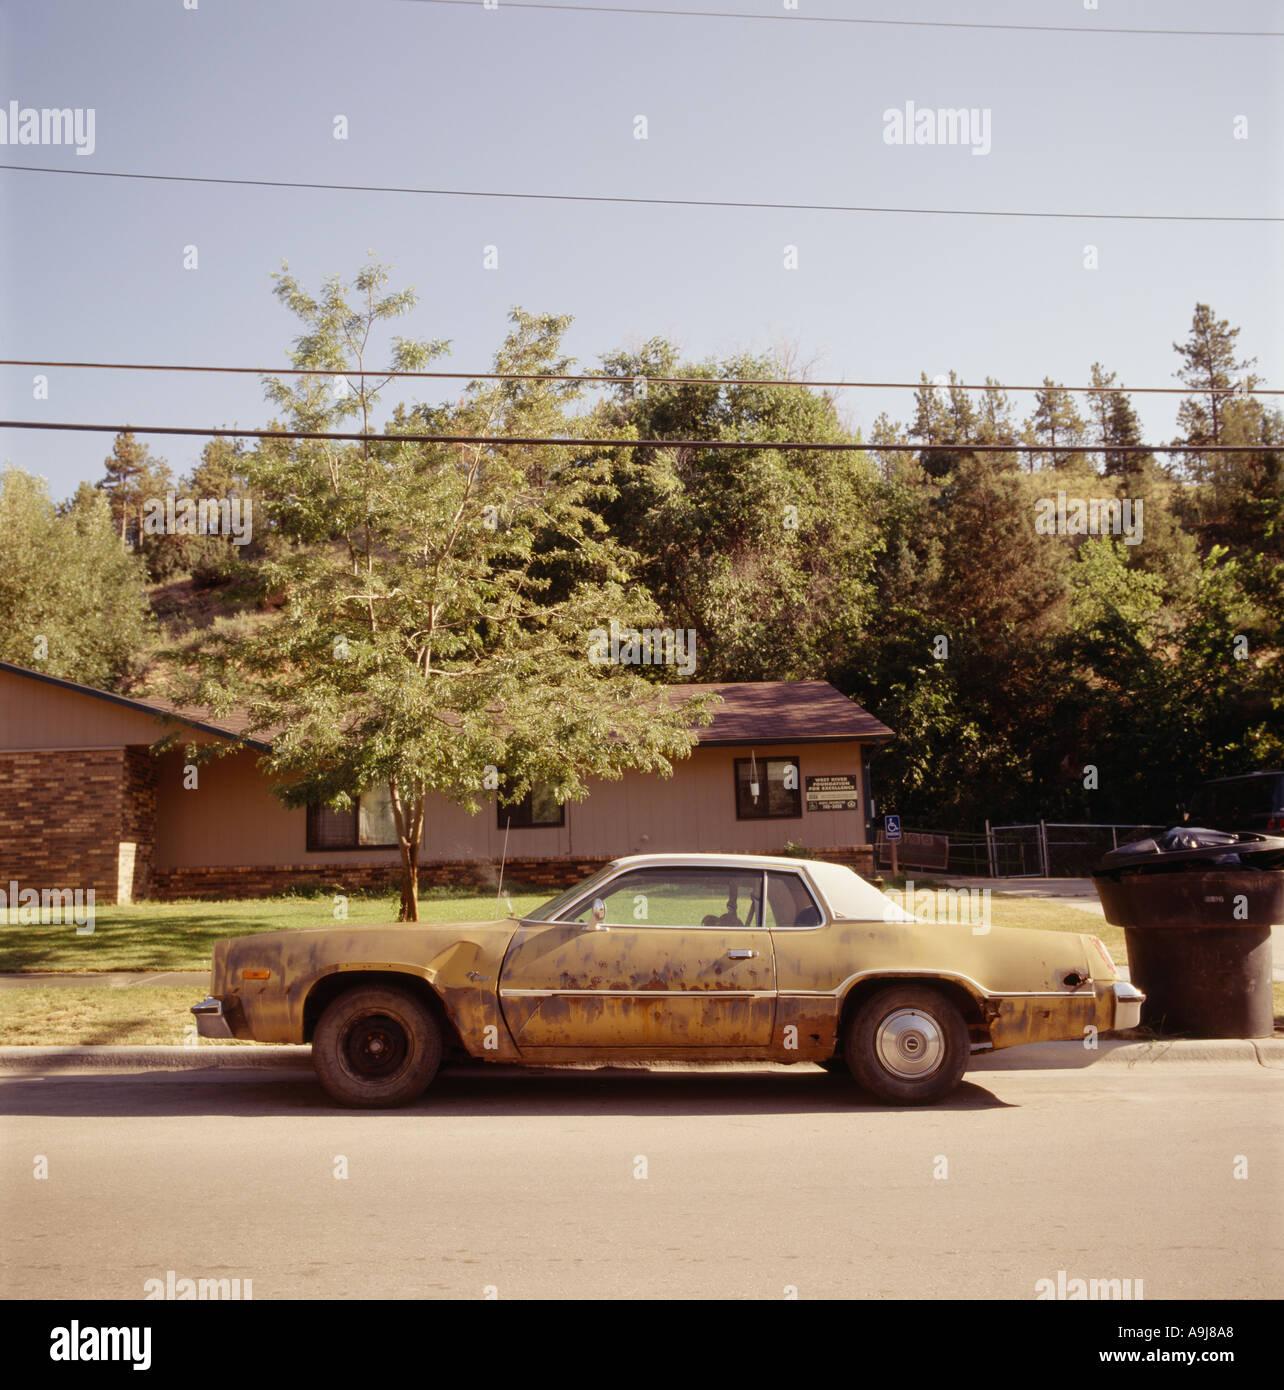 old car Stock Photo, Royalty Free Image: 2287783 - Alamy